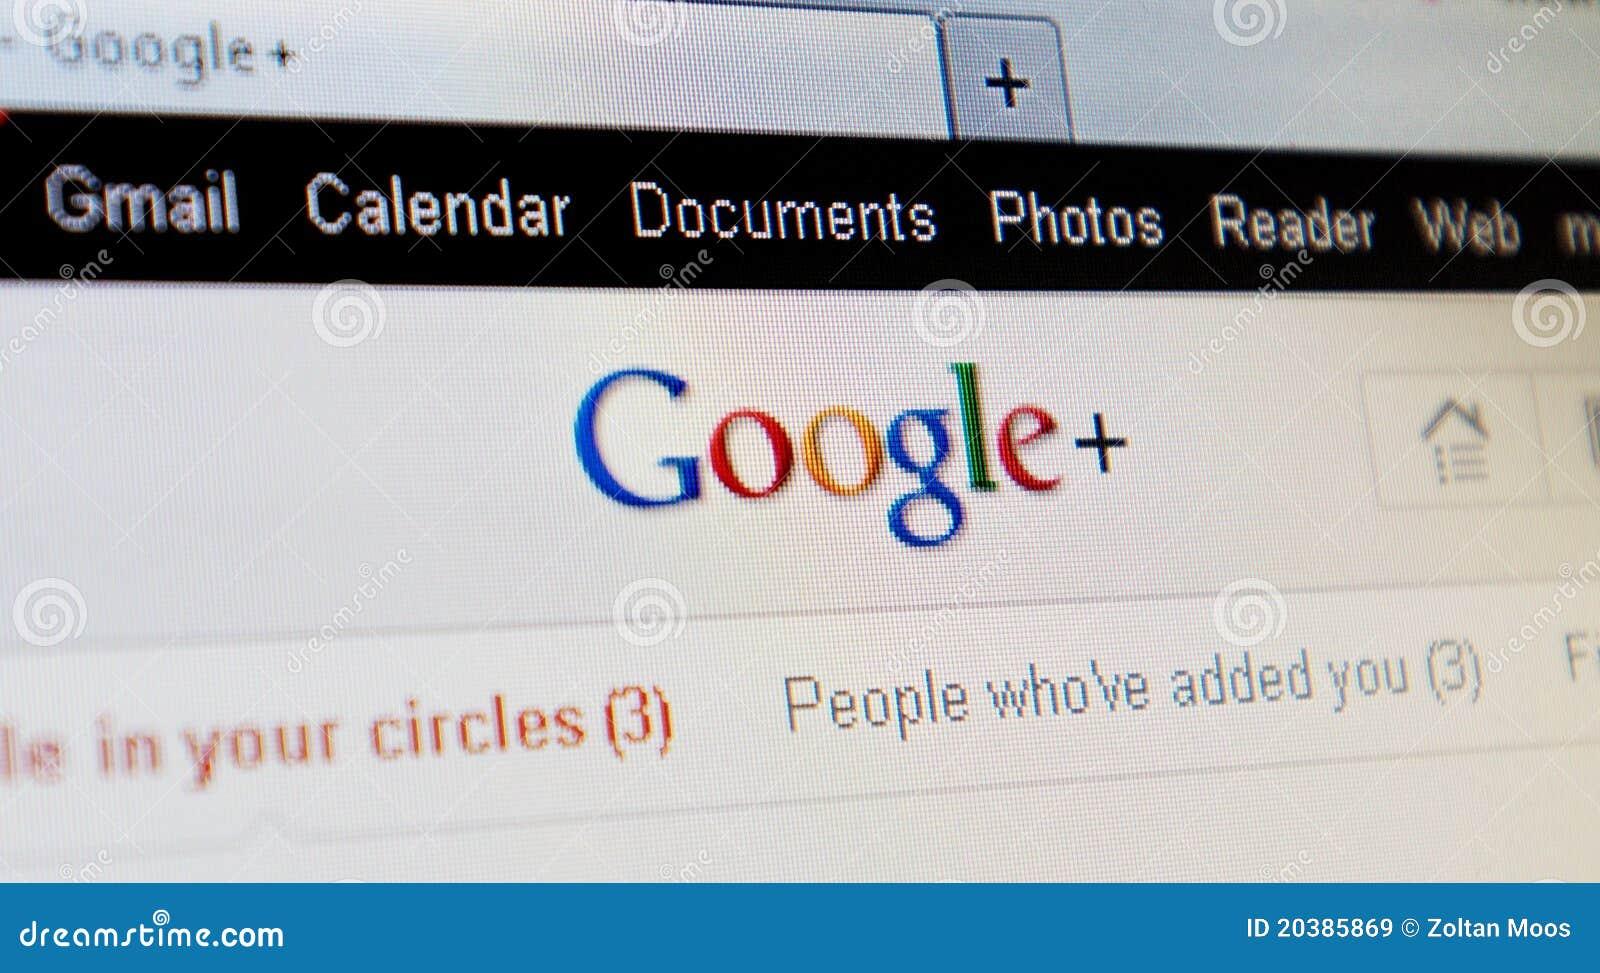 Google+ plus project